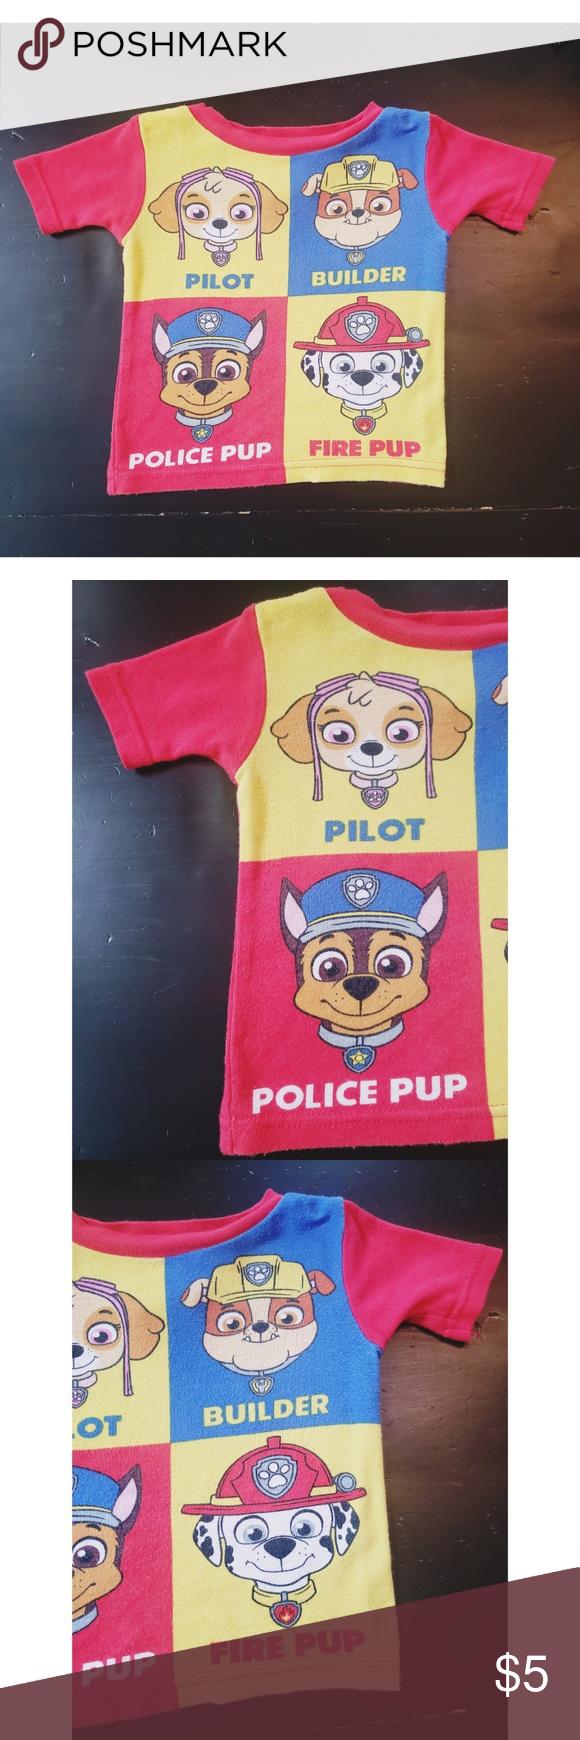 NICKELODEON PAW PATROL 2T T-SHIRT Pre-owned NICKELODEON Paw Patrol size 2T t-shirt in good condition  #1190 Nickelodeon Shirts & Tops Tees - Short Sleeve